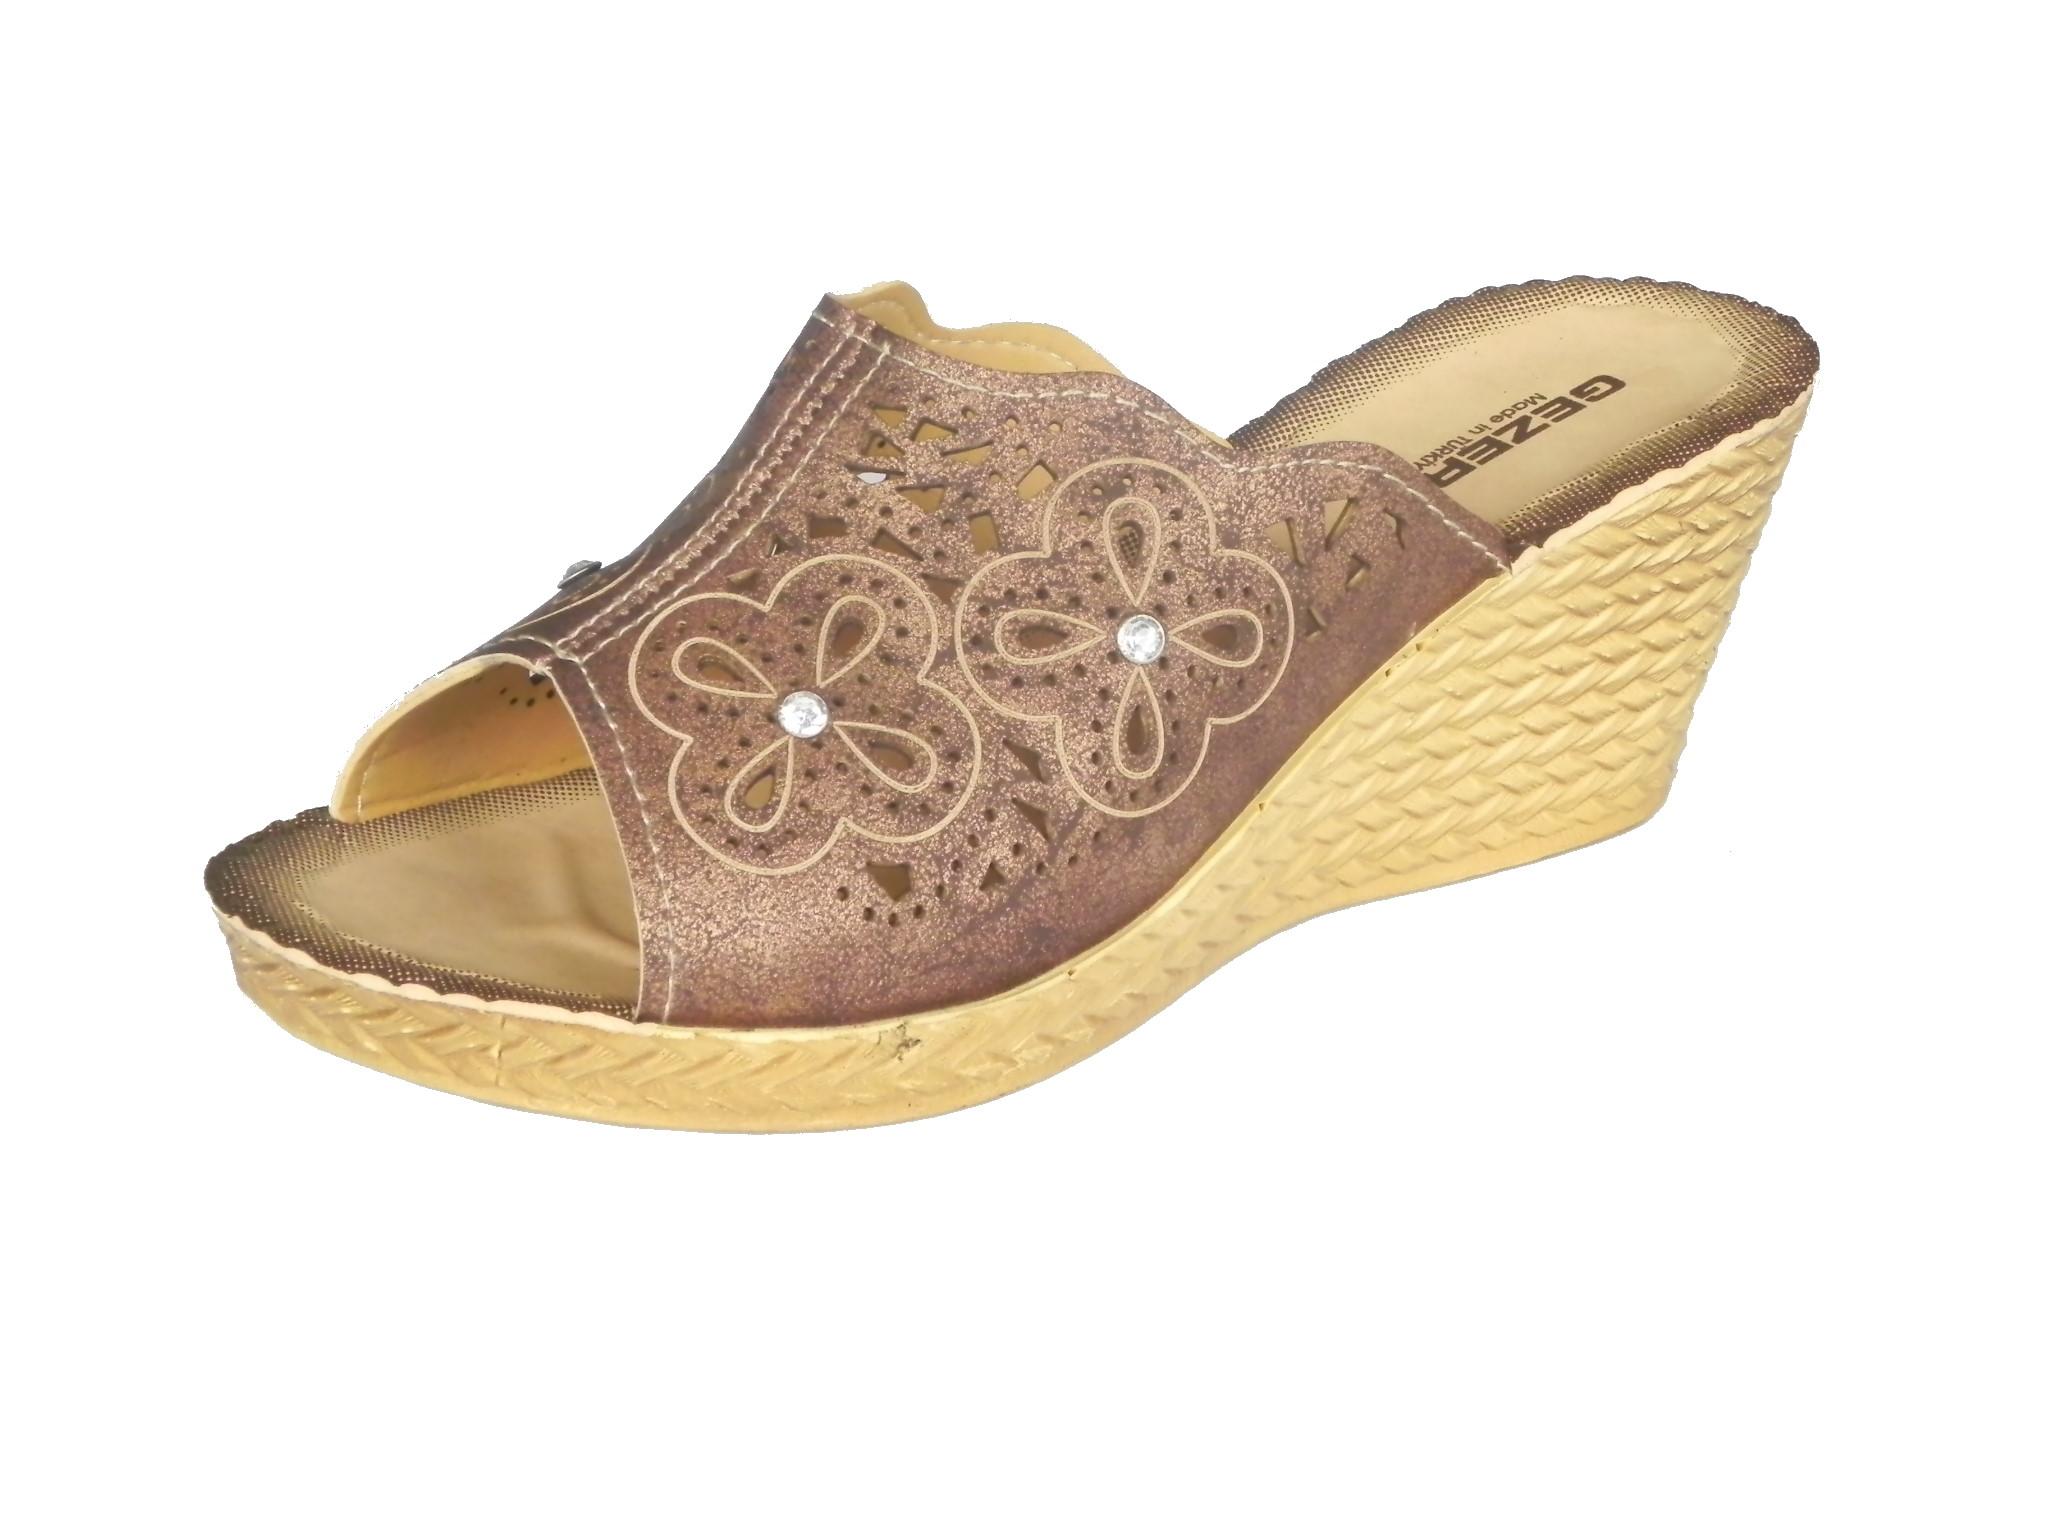 chaussure femme mule talon mule femme a talon pas cher mule femme a talon pas cher. Black Bedroom Furniture Sets. Home Design Ideas